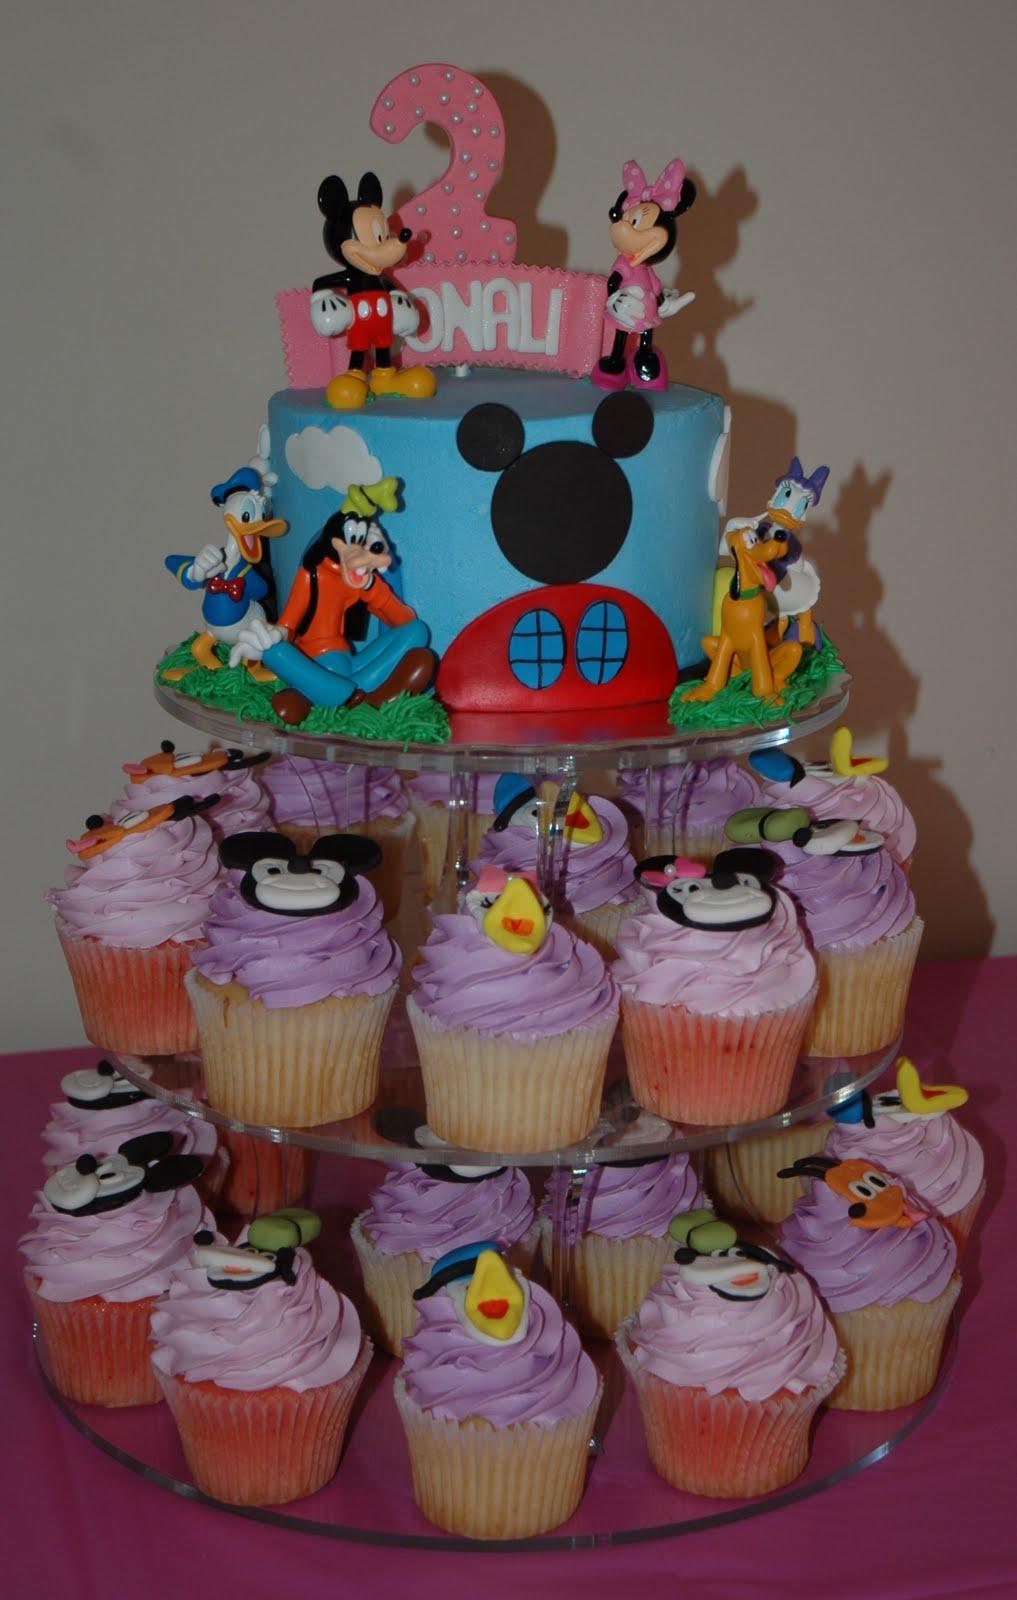 Papier peint intissé S M L XL XXL und 3XL Disney Mickey  - Papier Peint Mickey Mouse